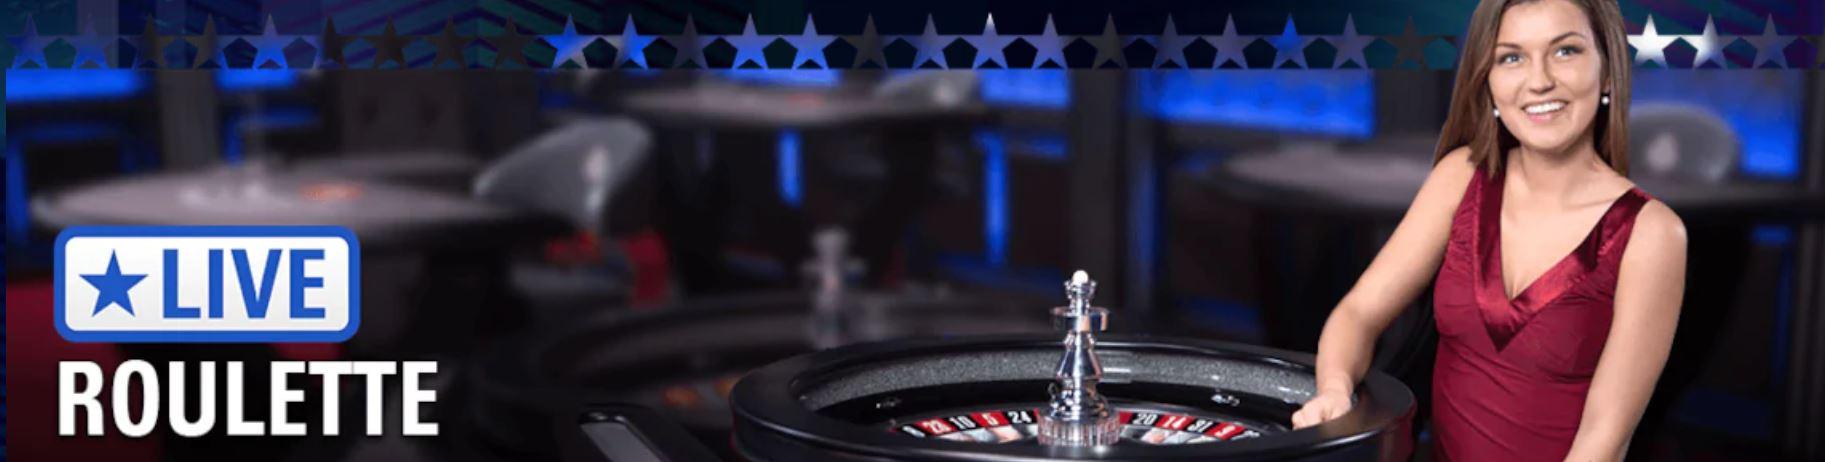 Podrás jugar a la ruleta en pokerstars casino.